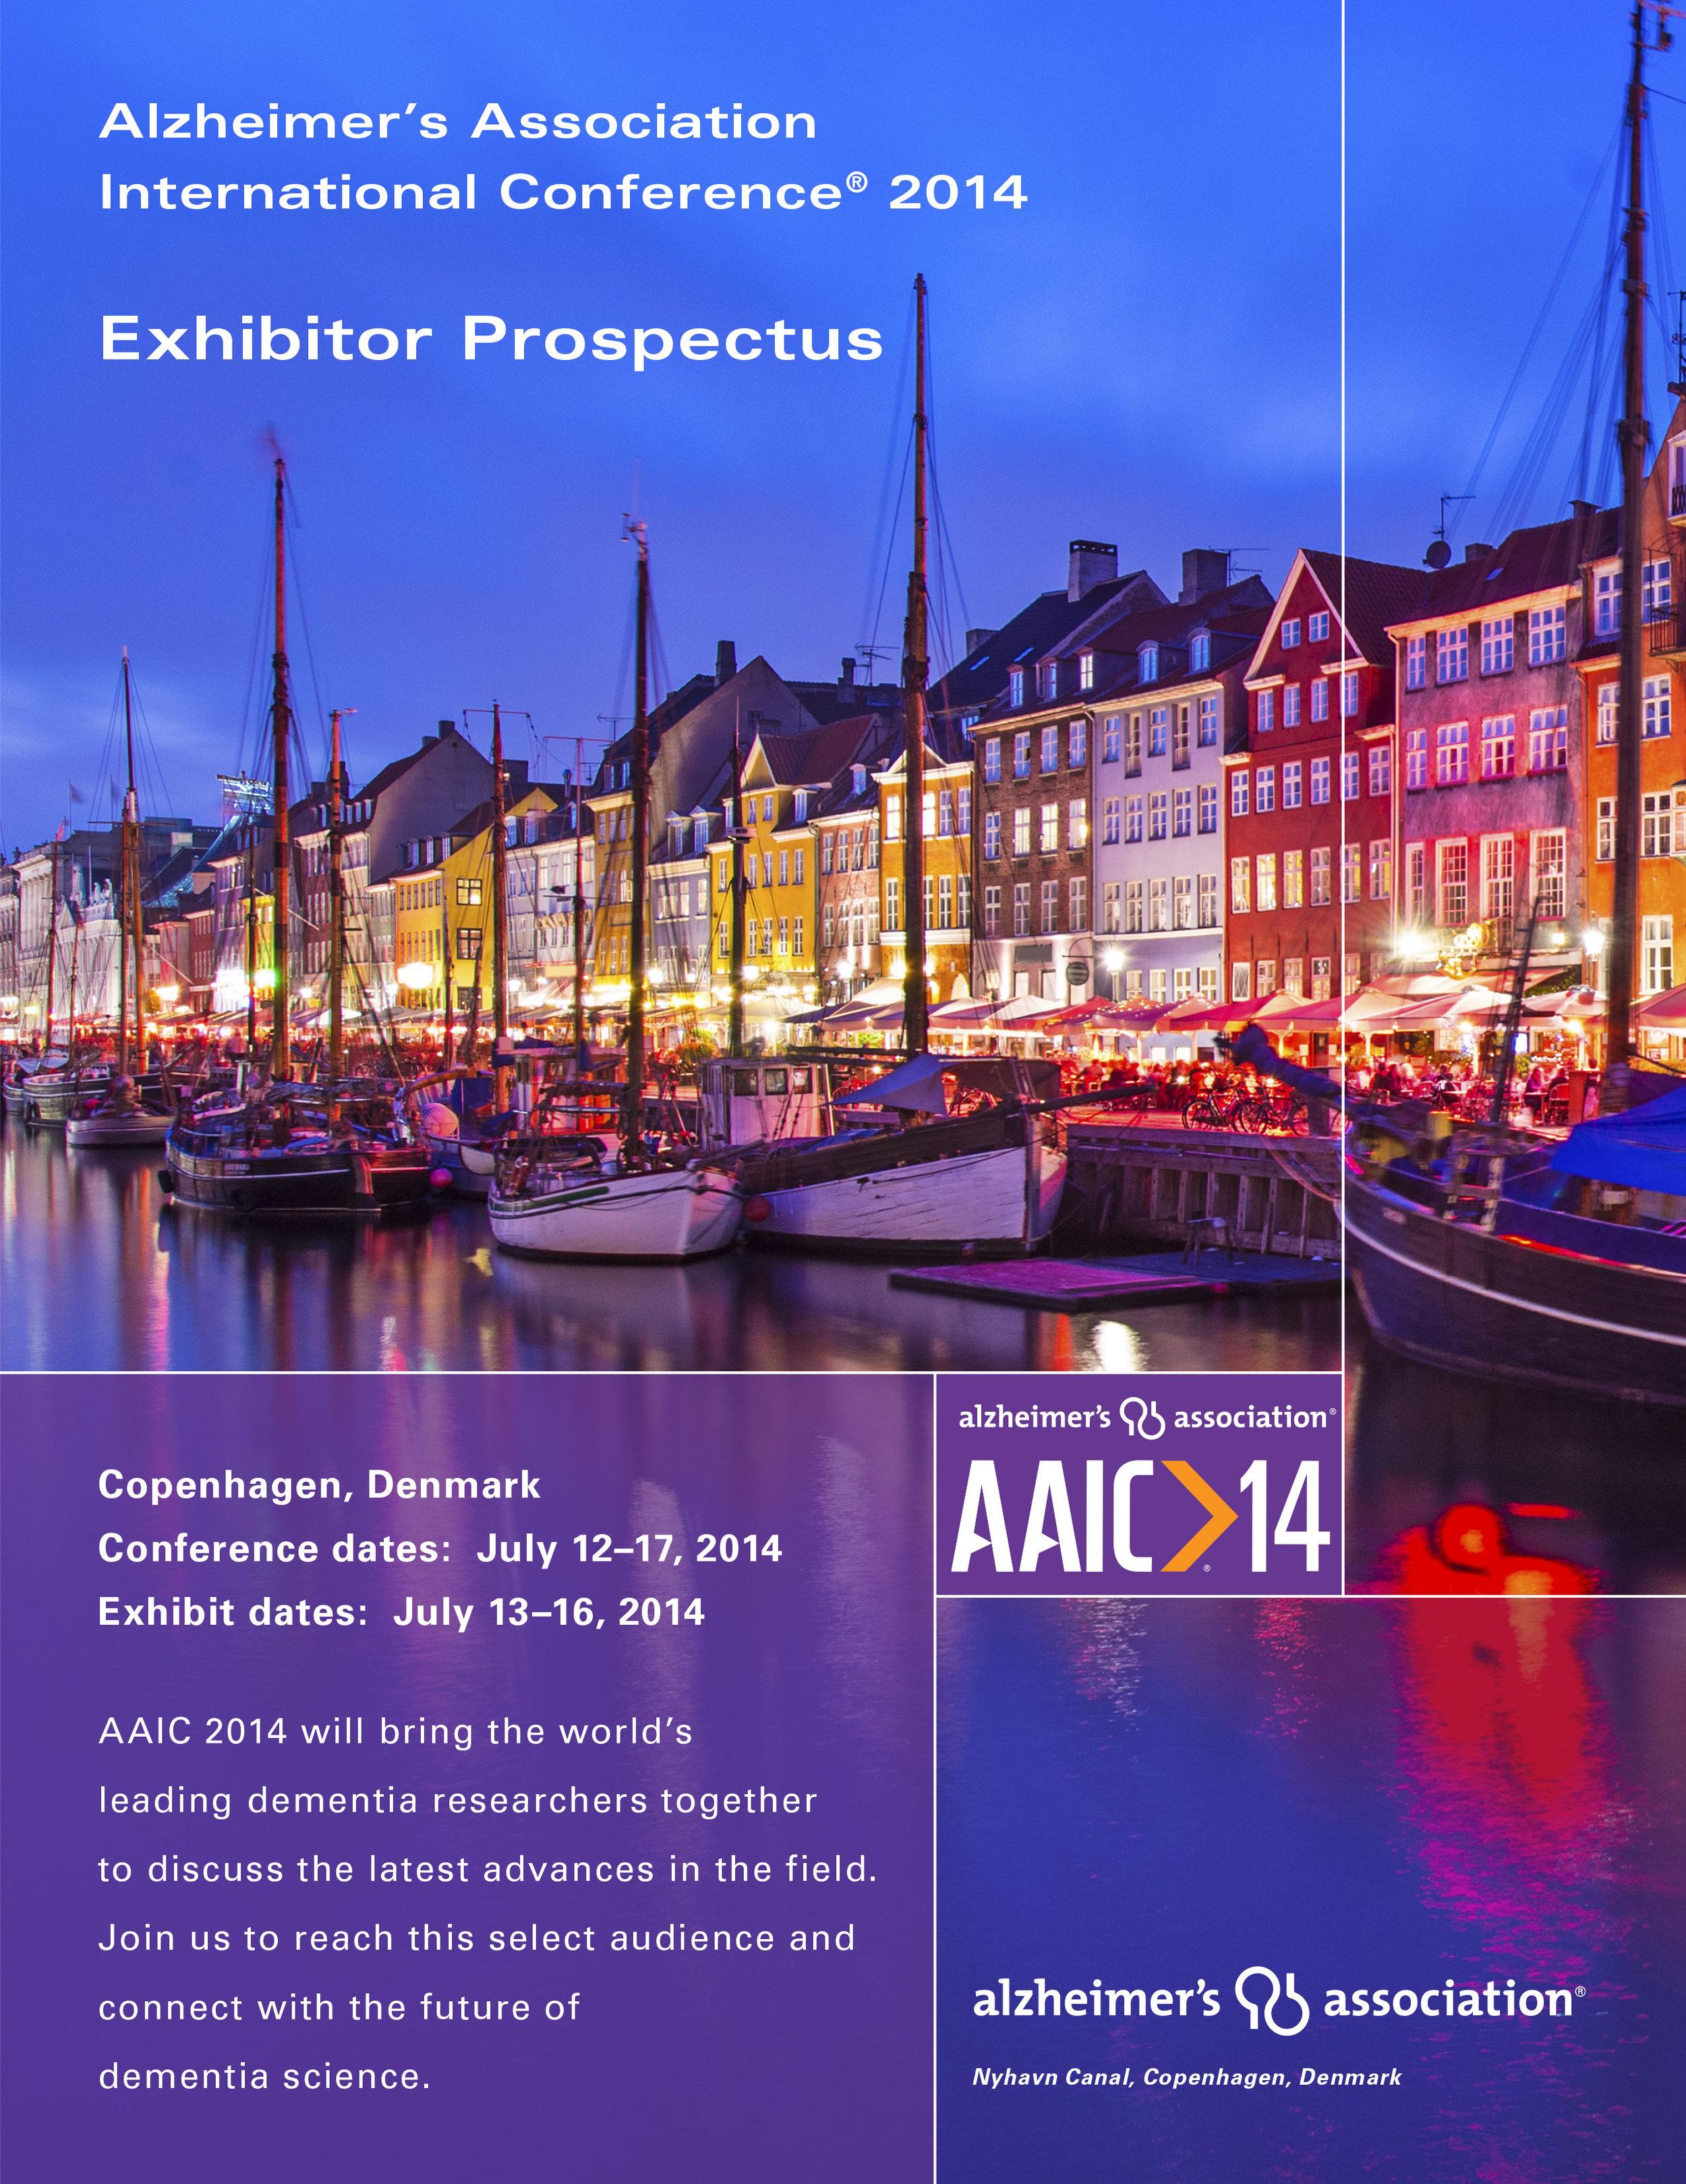 AAIC14 EXHIBITOR PROSPECTUS